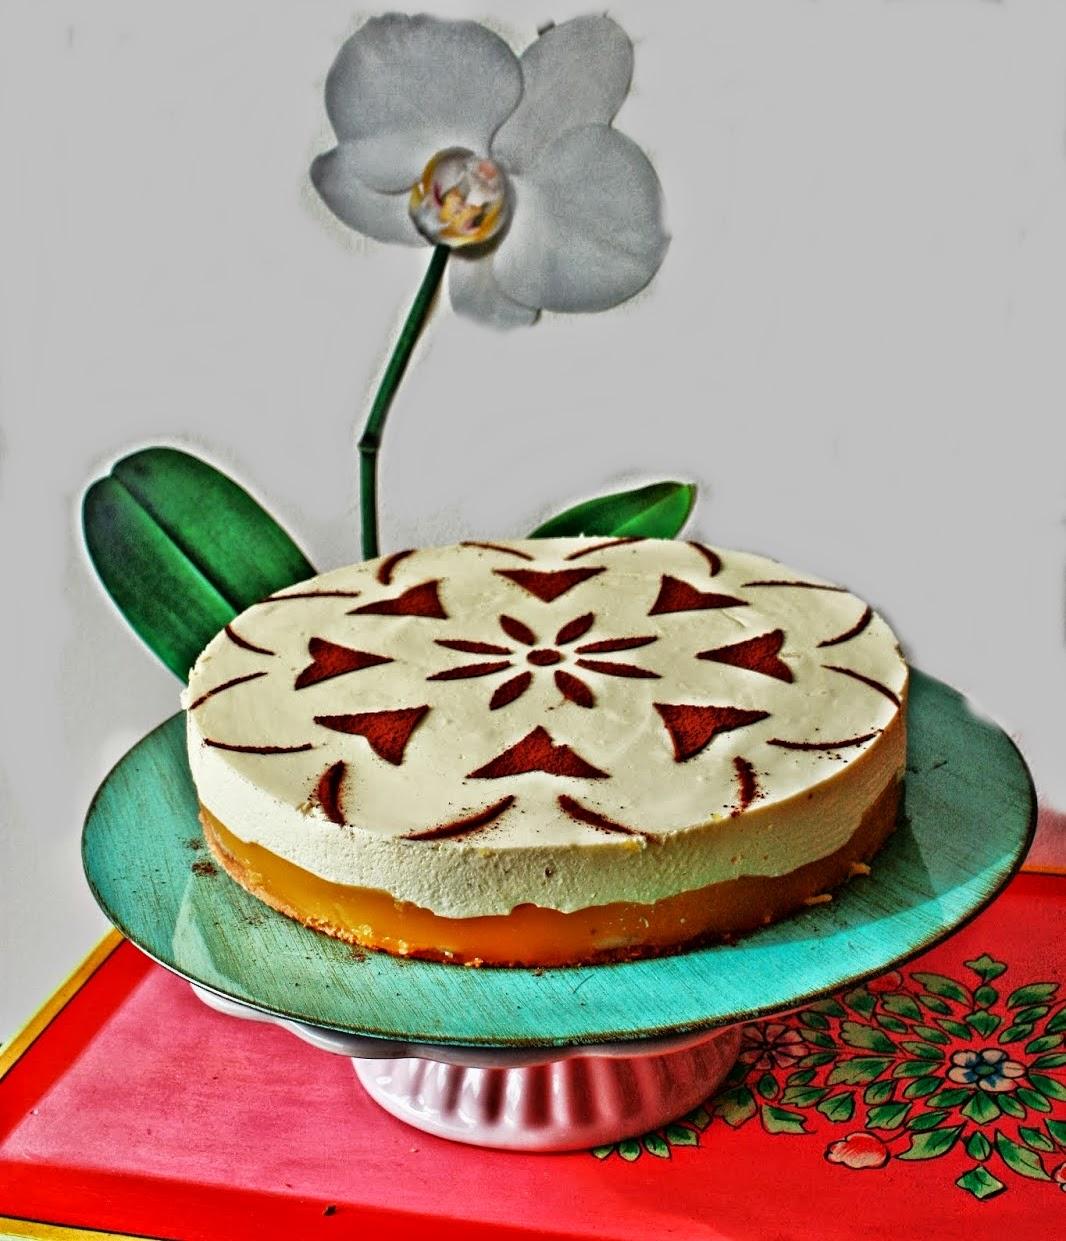 Bananen Maracuja Torte mit Eierlikör Schmand Guss